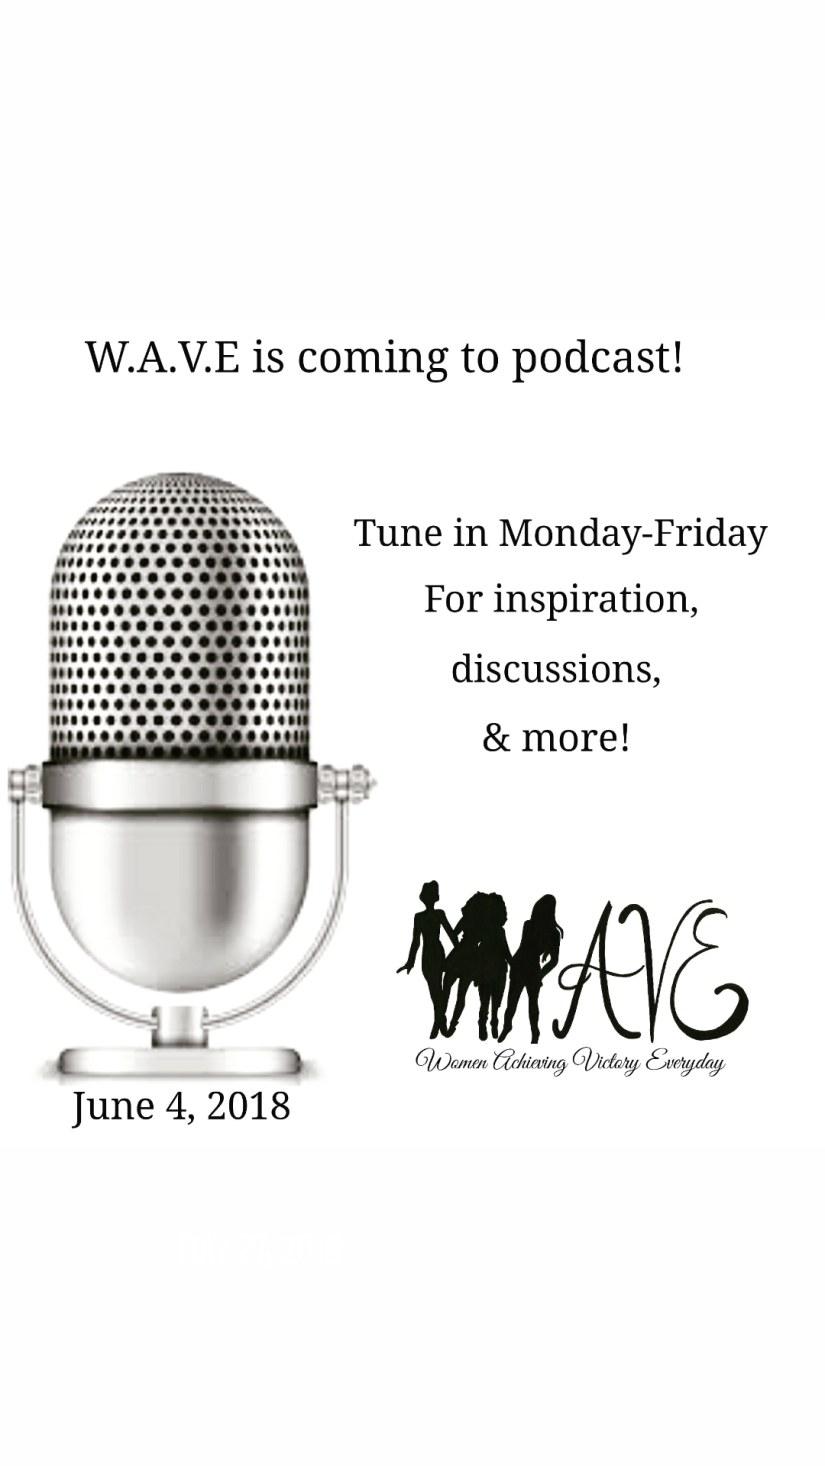 W.A.V.E- Now On AnchorPodcast!